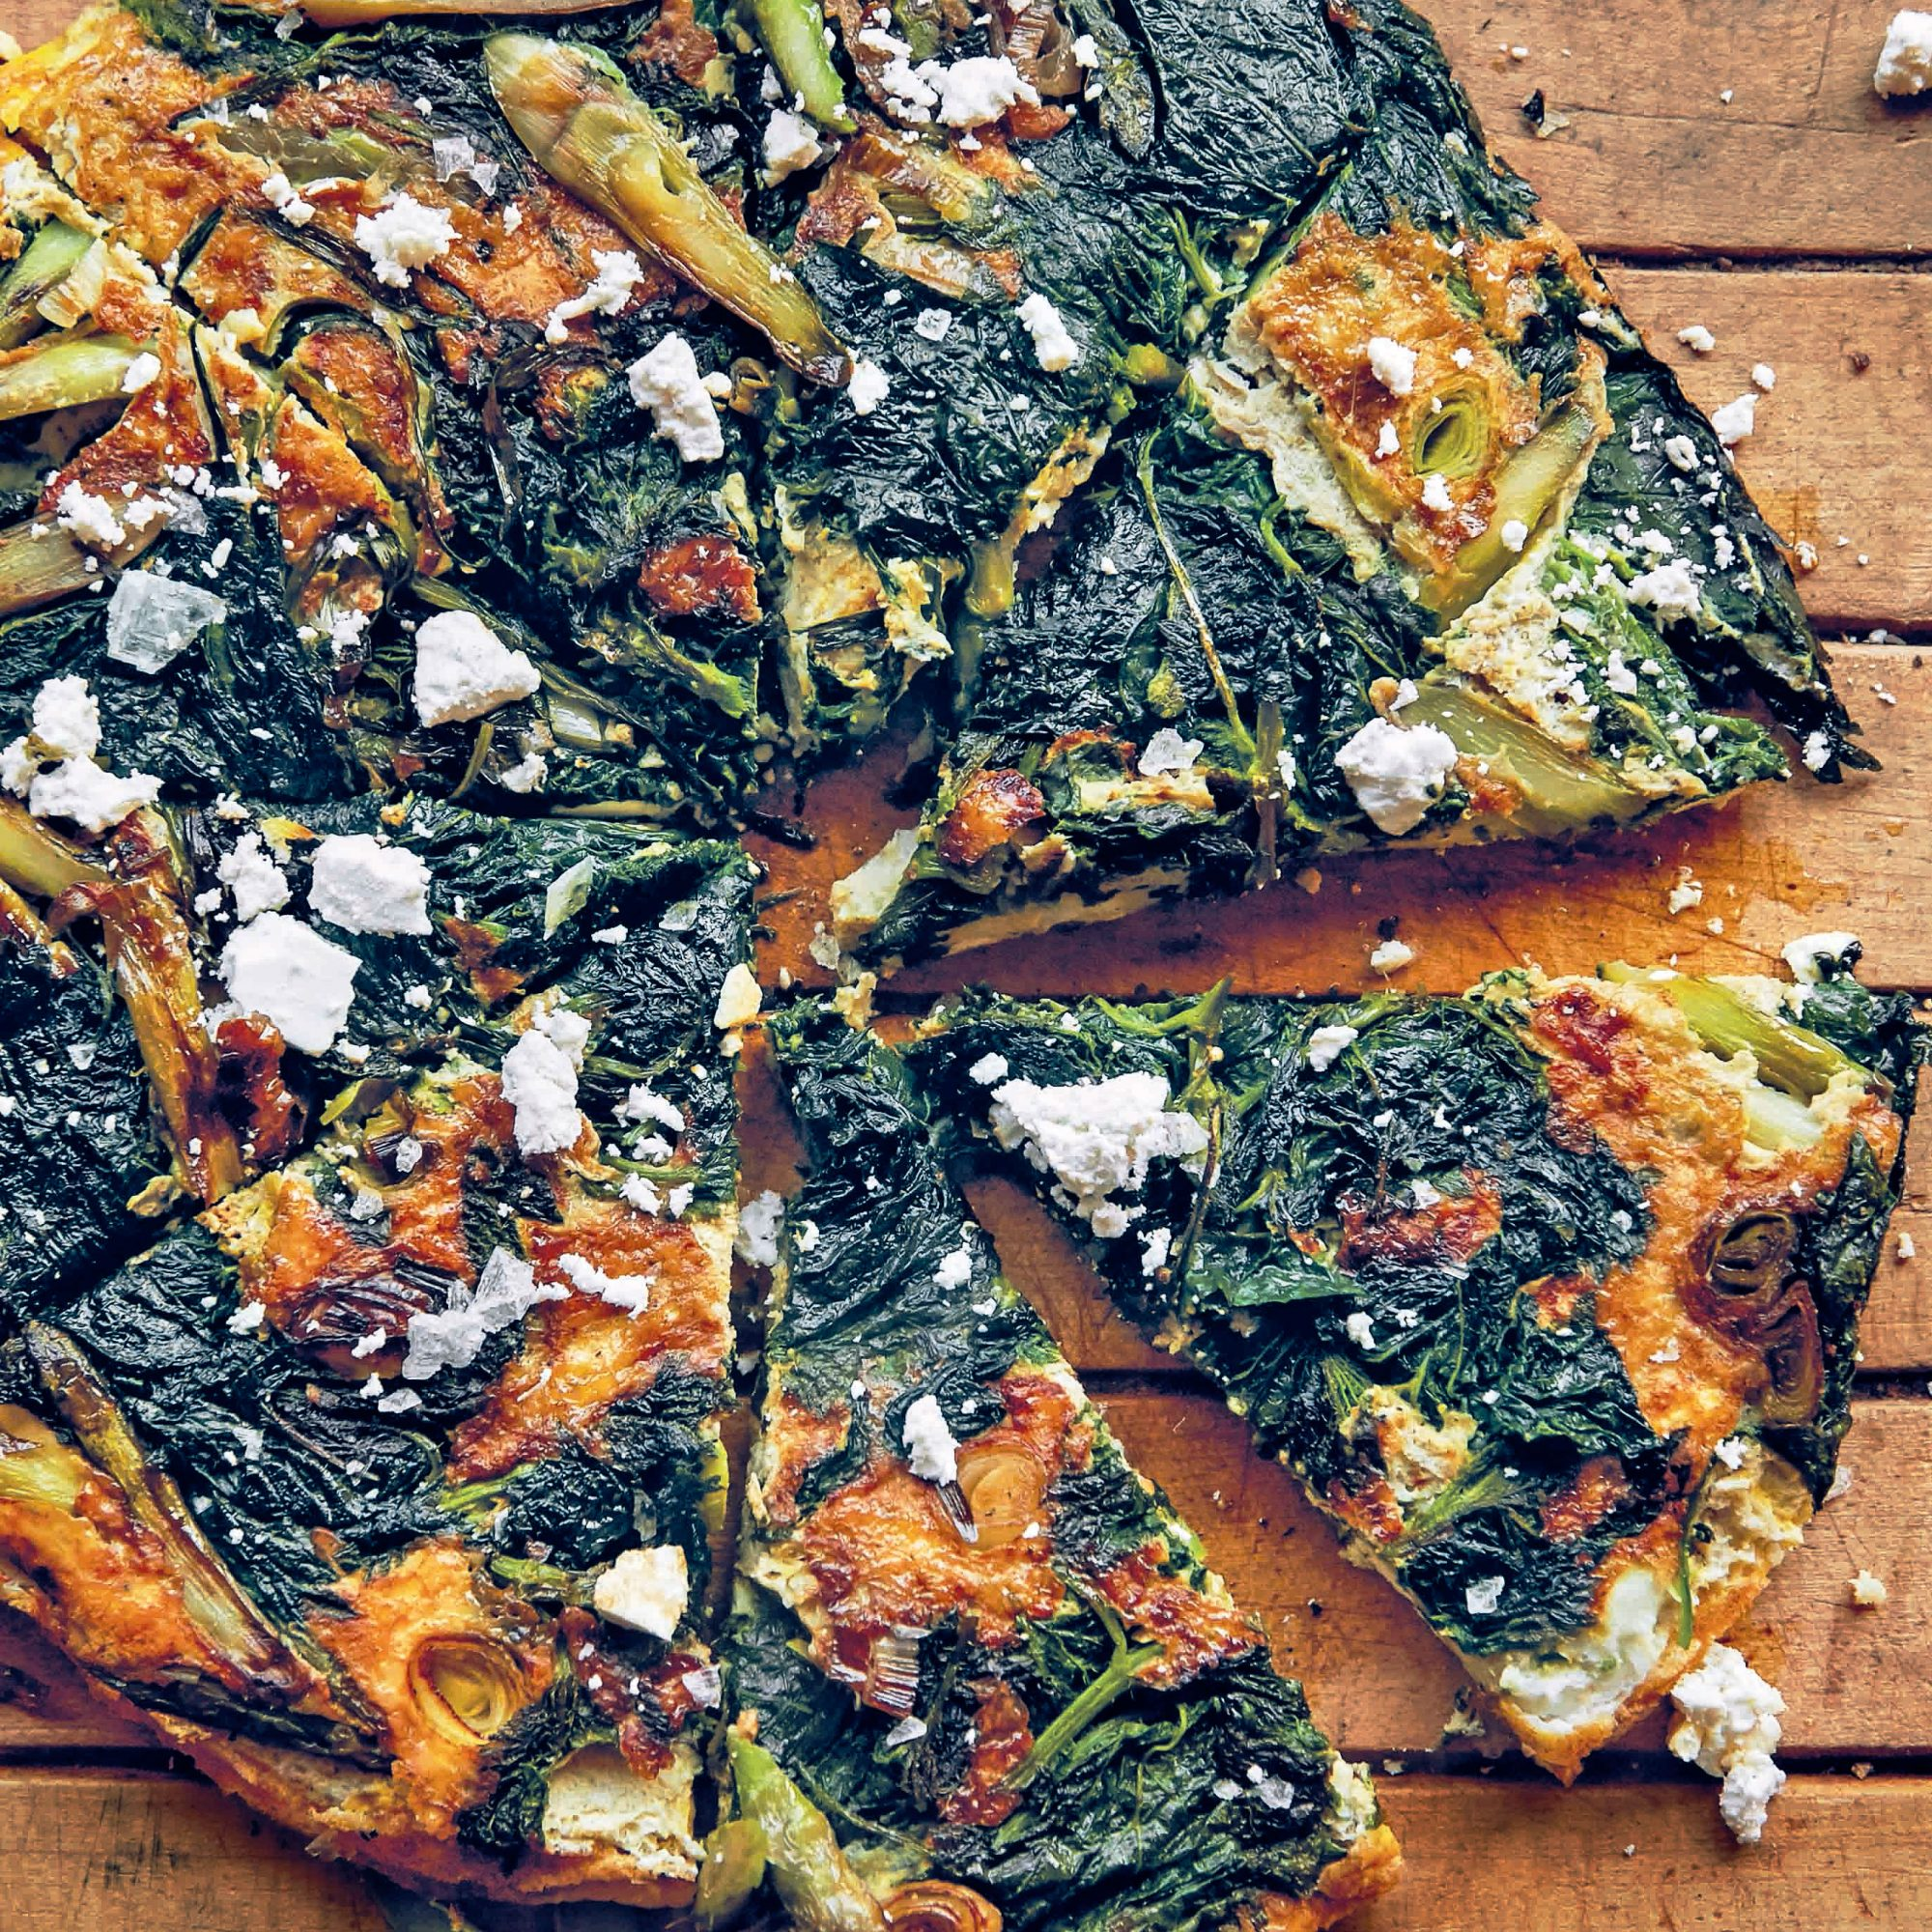 Asparagus, Nettle, and Green Garlic Frittata image